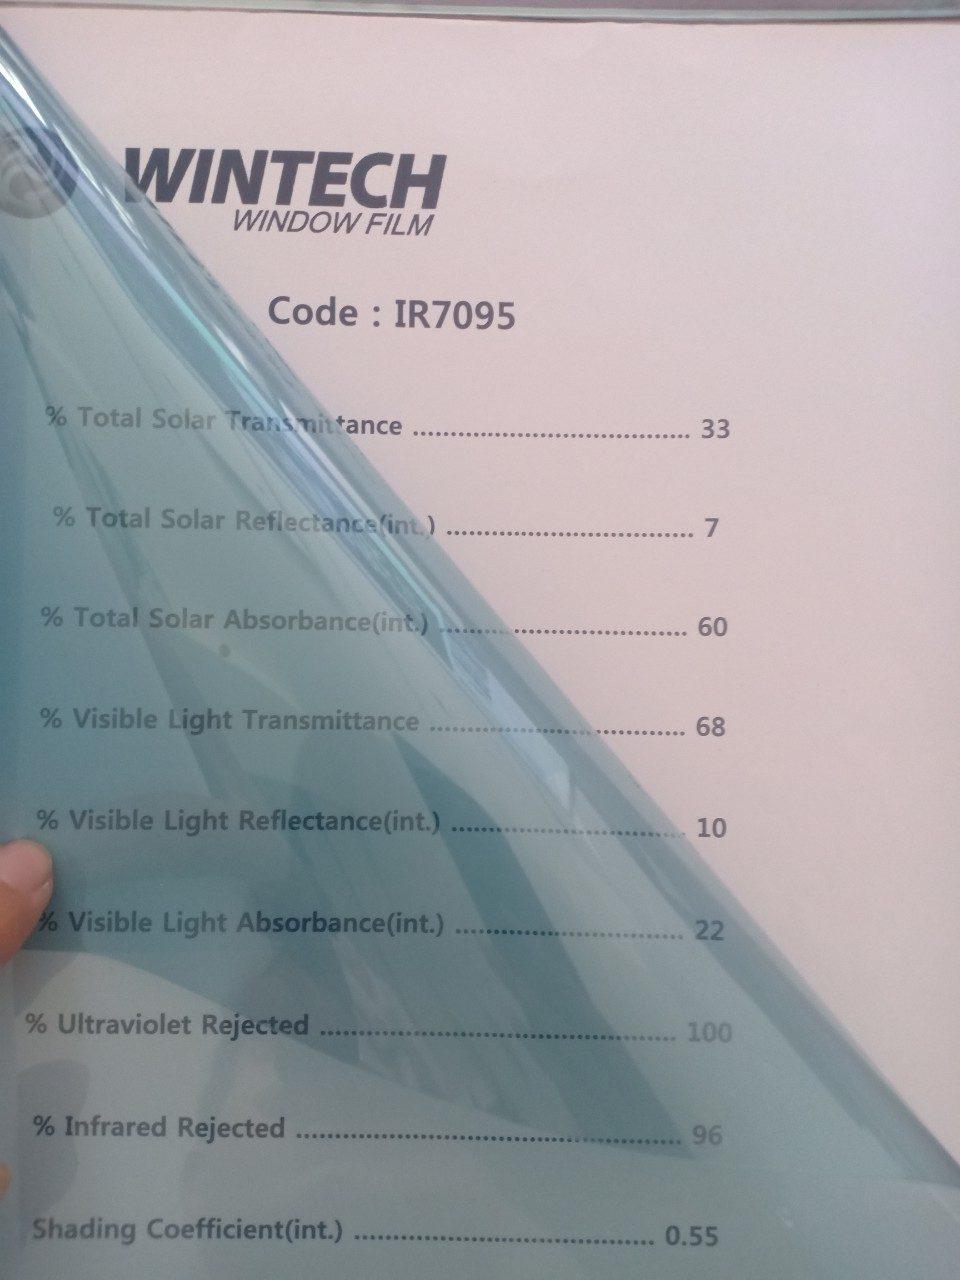 wintechfilm-ir-7095